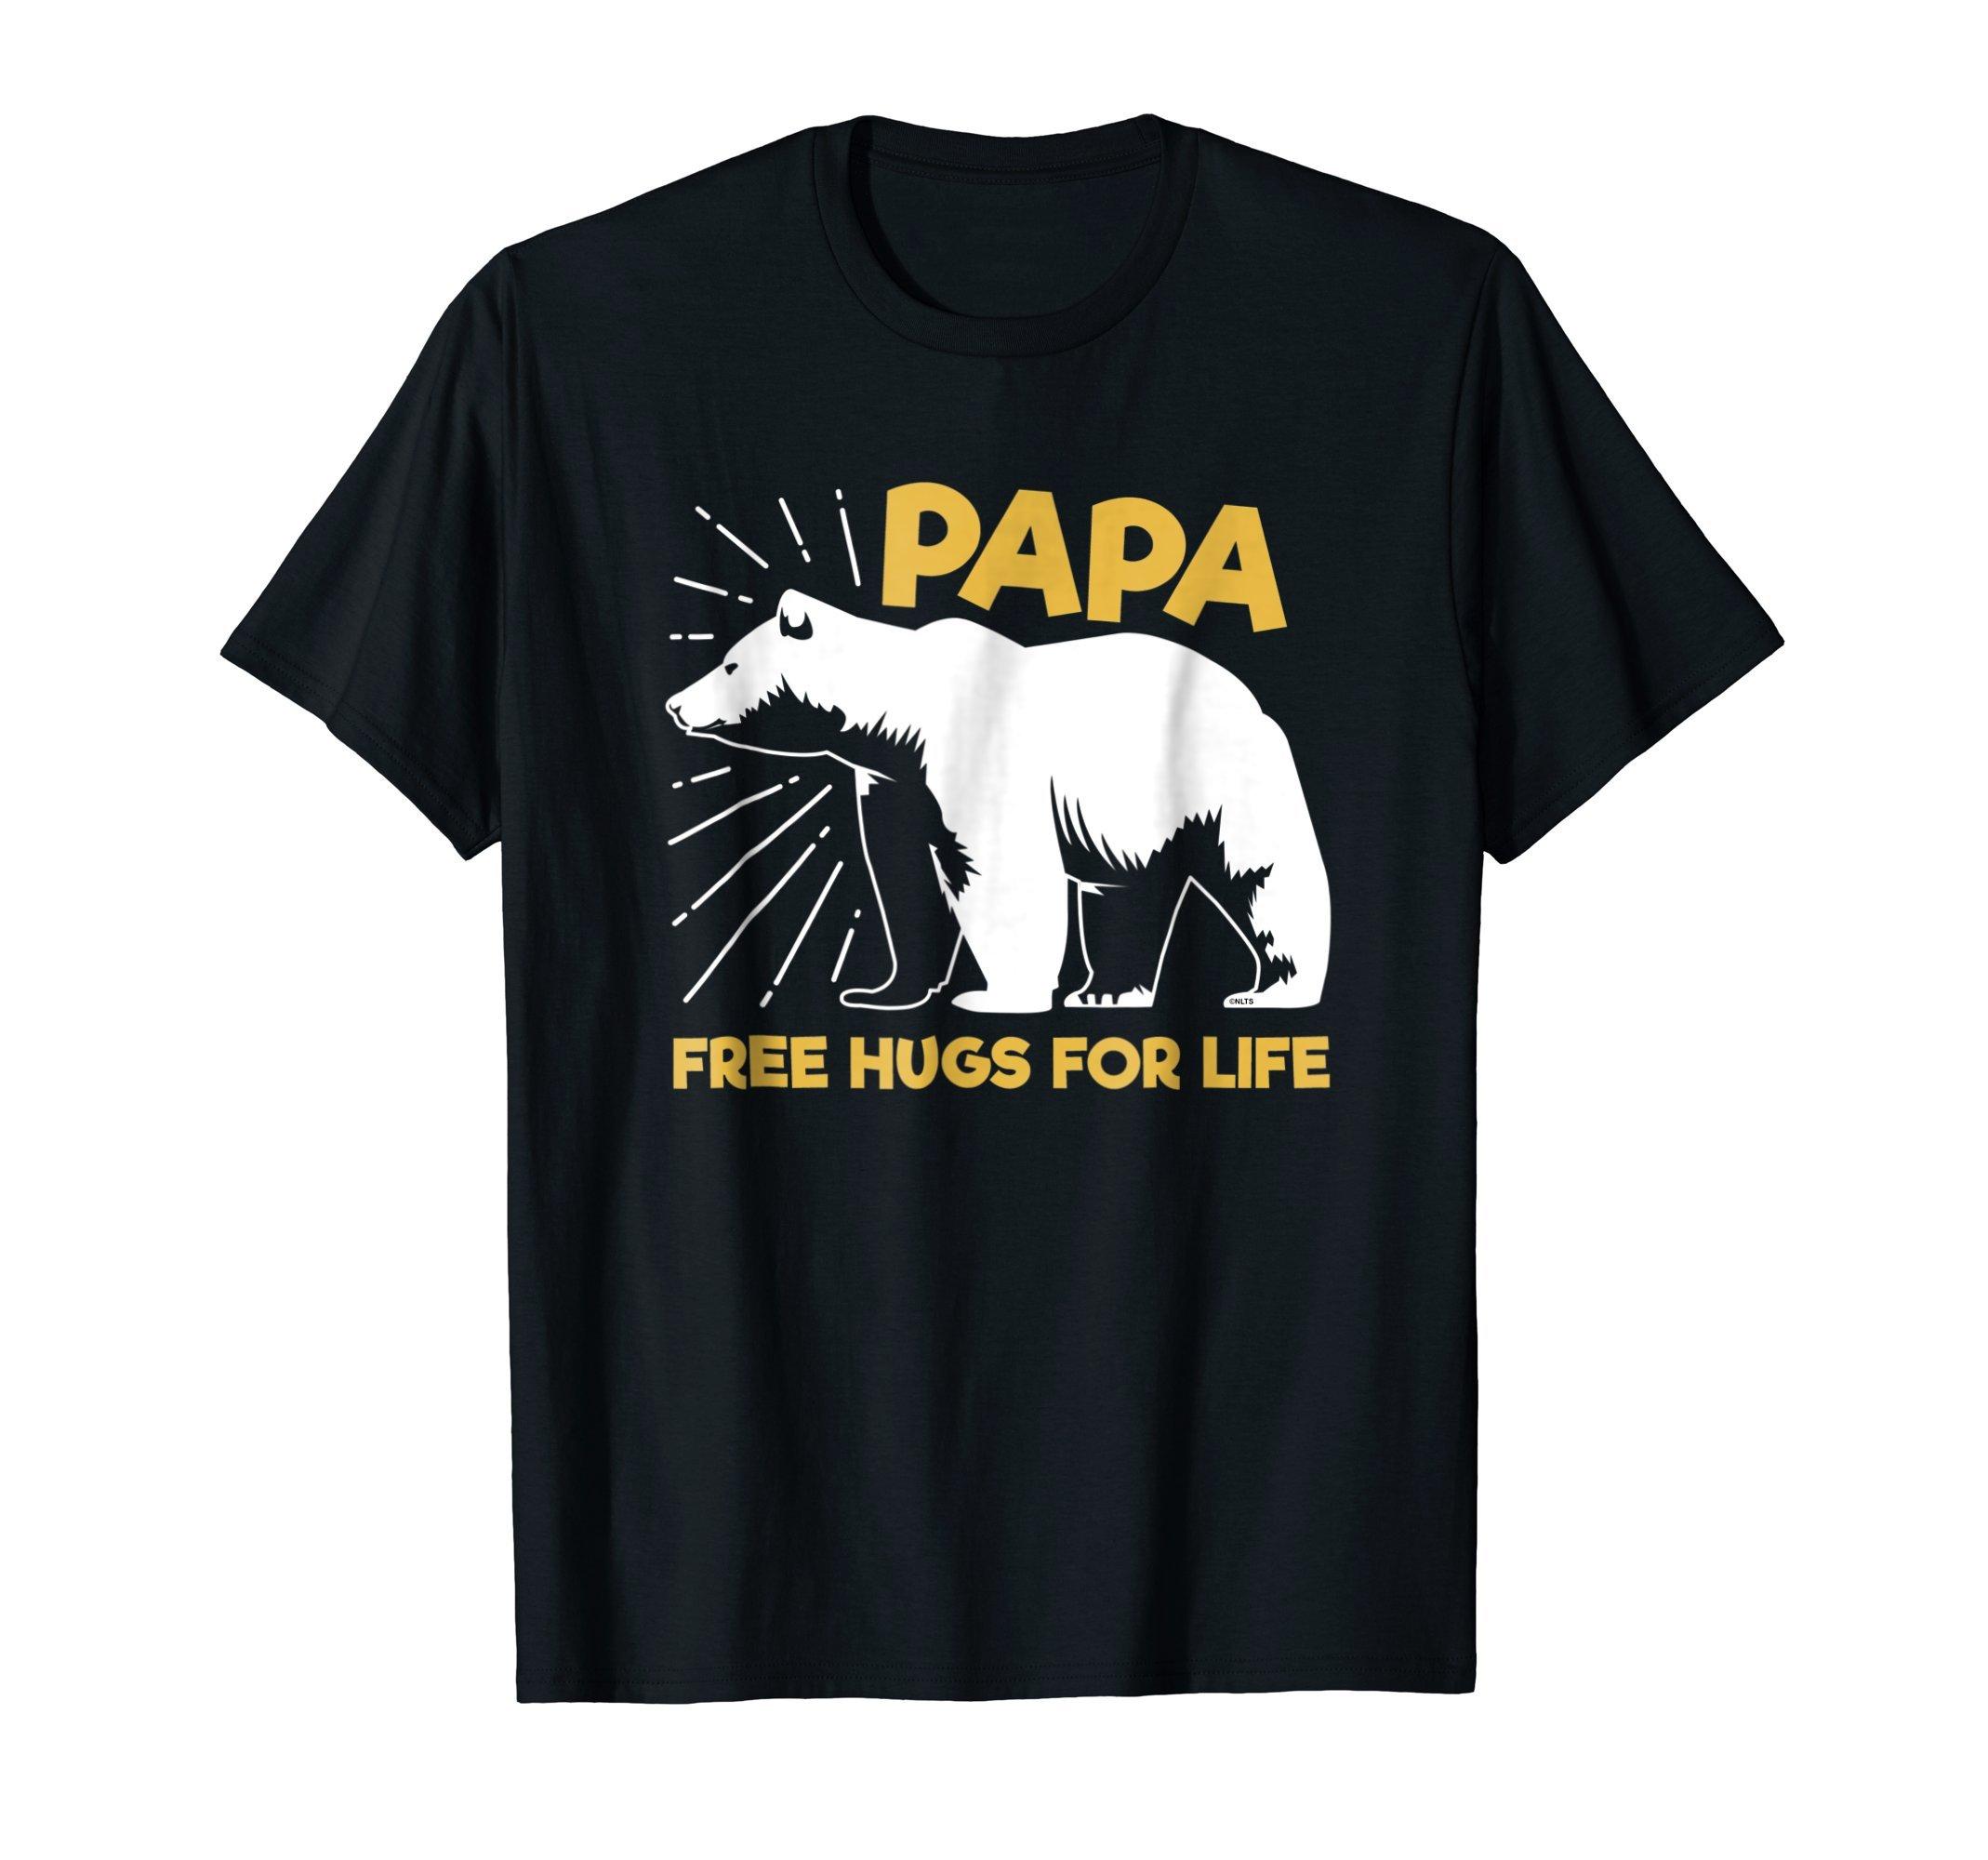 Papa-Bear-Free-Hugs-Dad-T-Shirt-Fathers-Day-Tee-Shirt-Gift